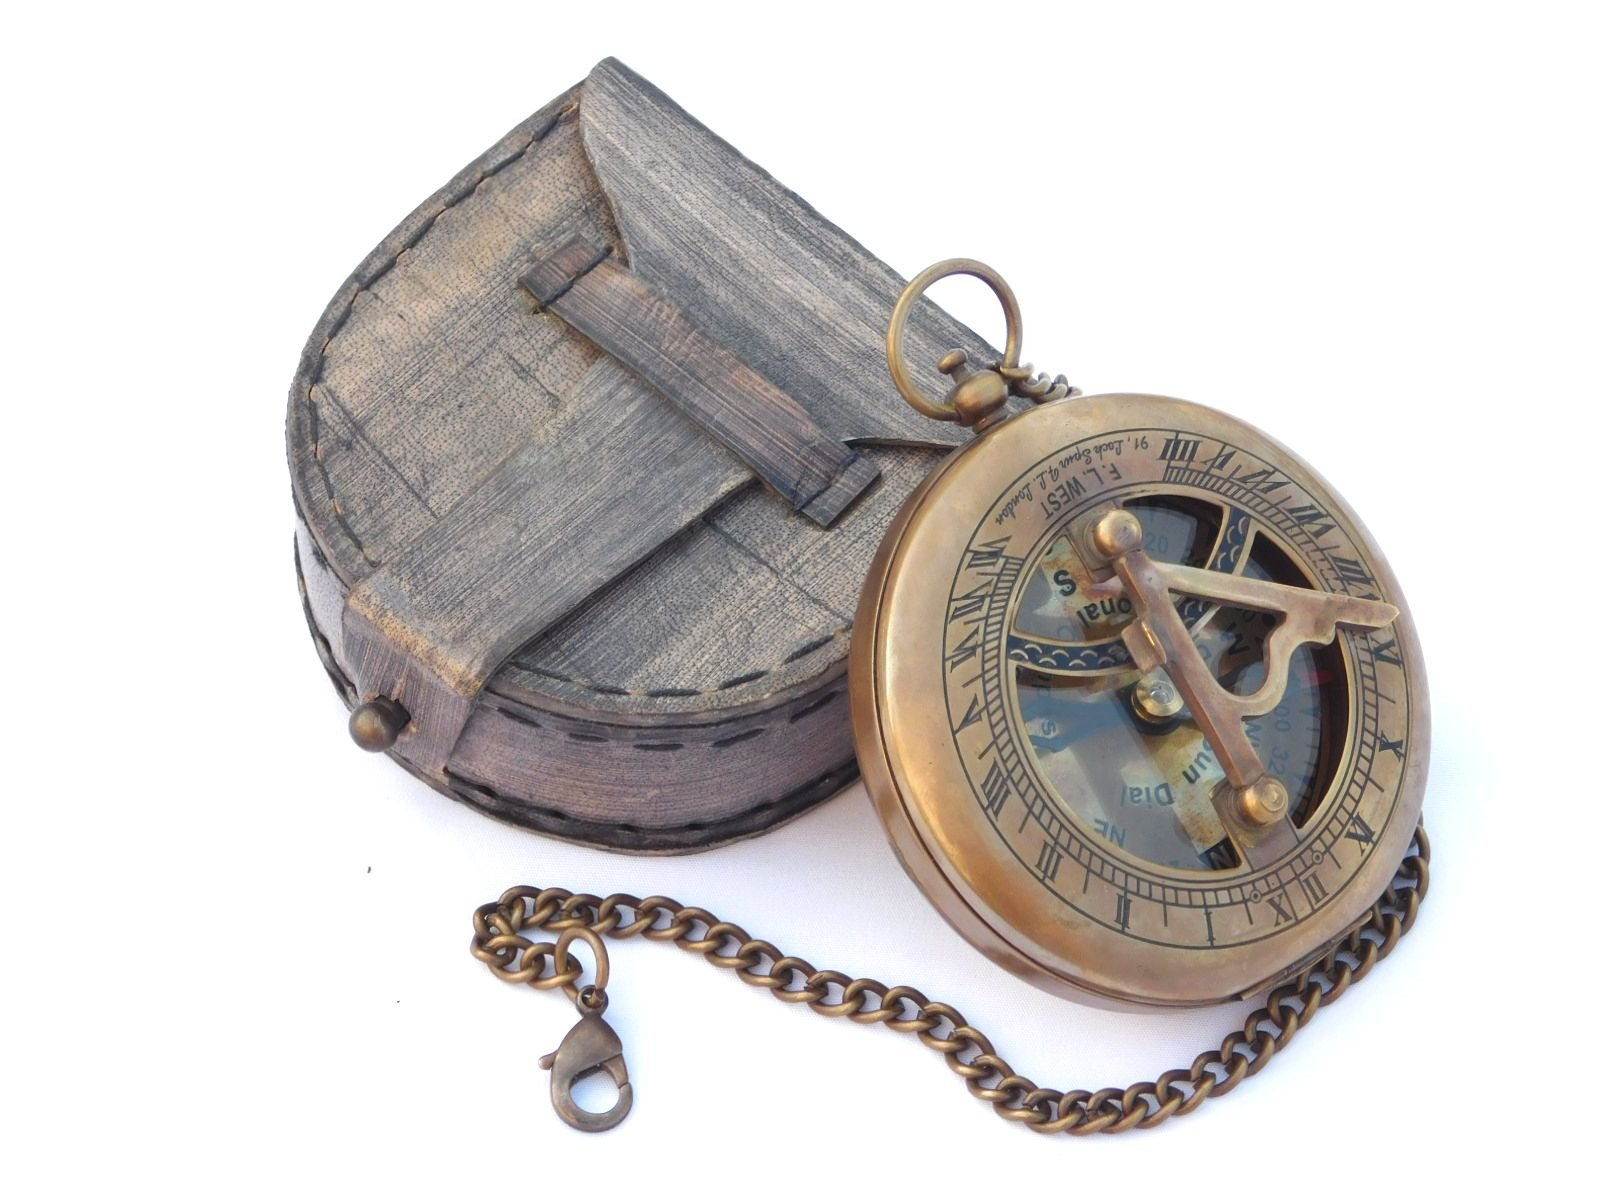 Neovivid Brass Sundial Compass With Chain & Leather Case - Marine Nautical - Sun Clock - Steampunk Accessory by Neovivid